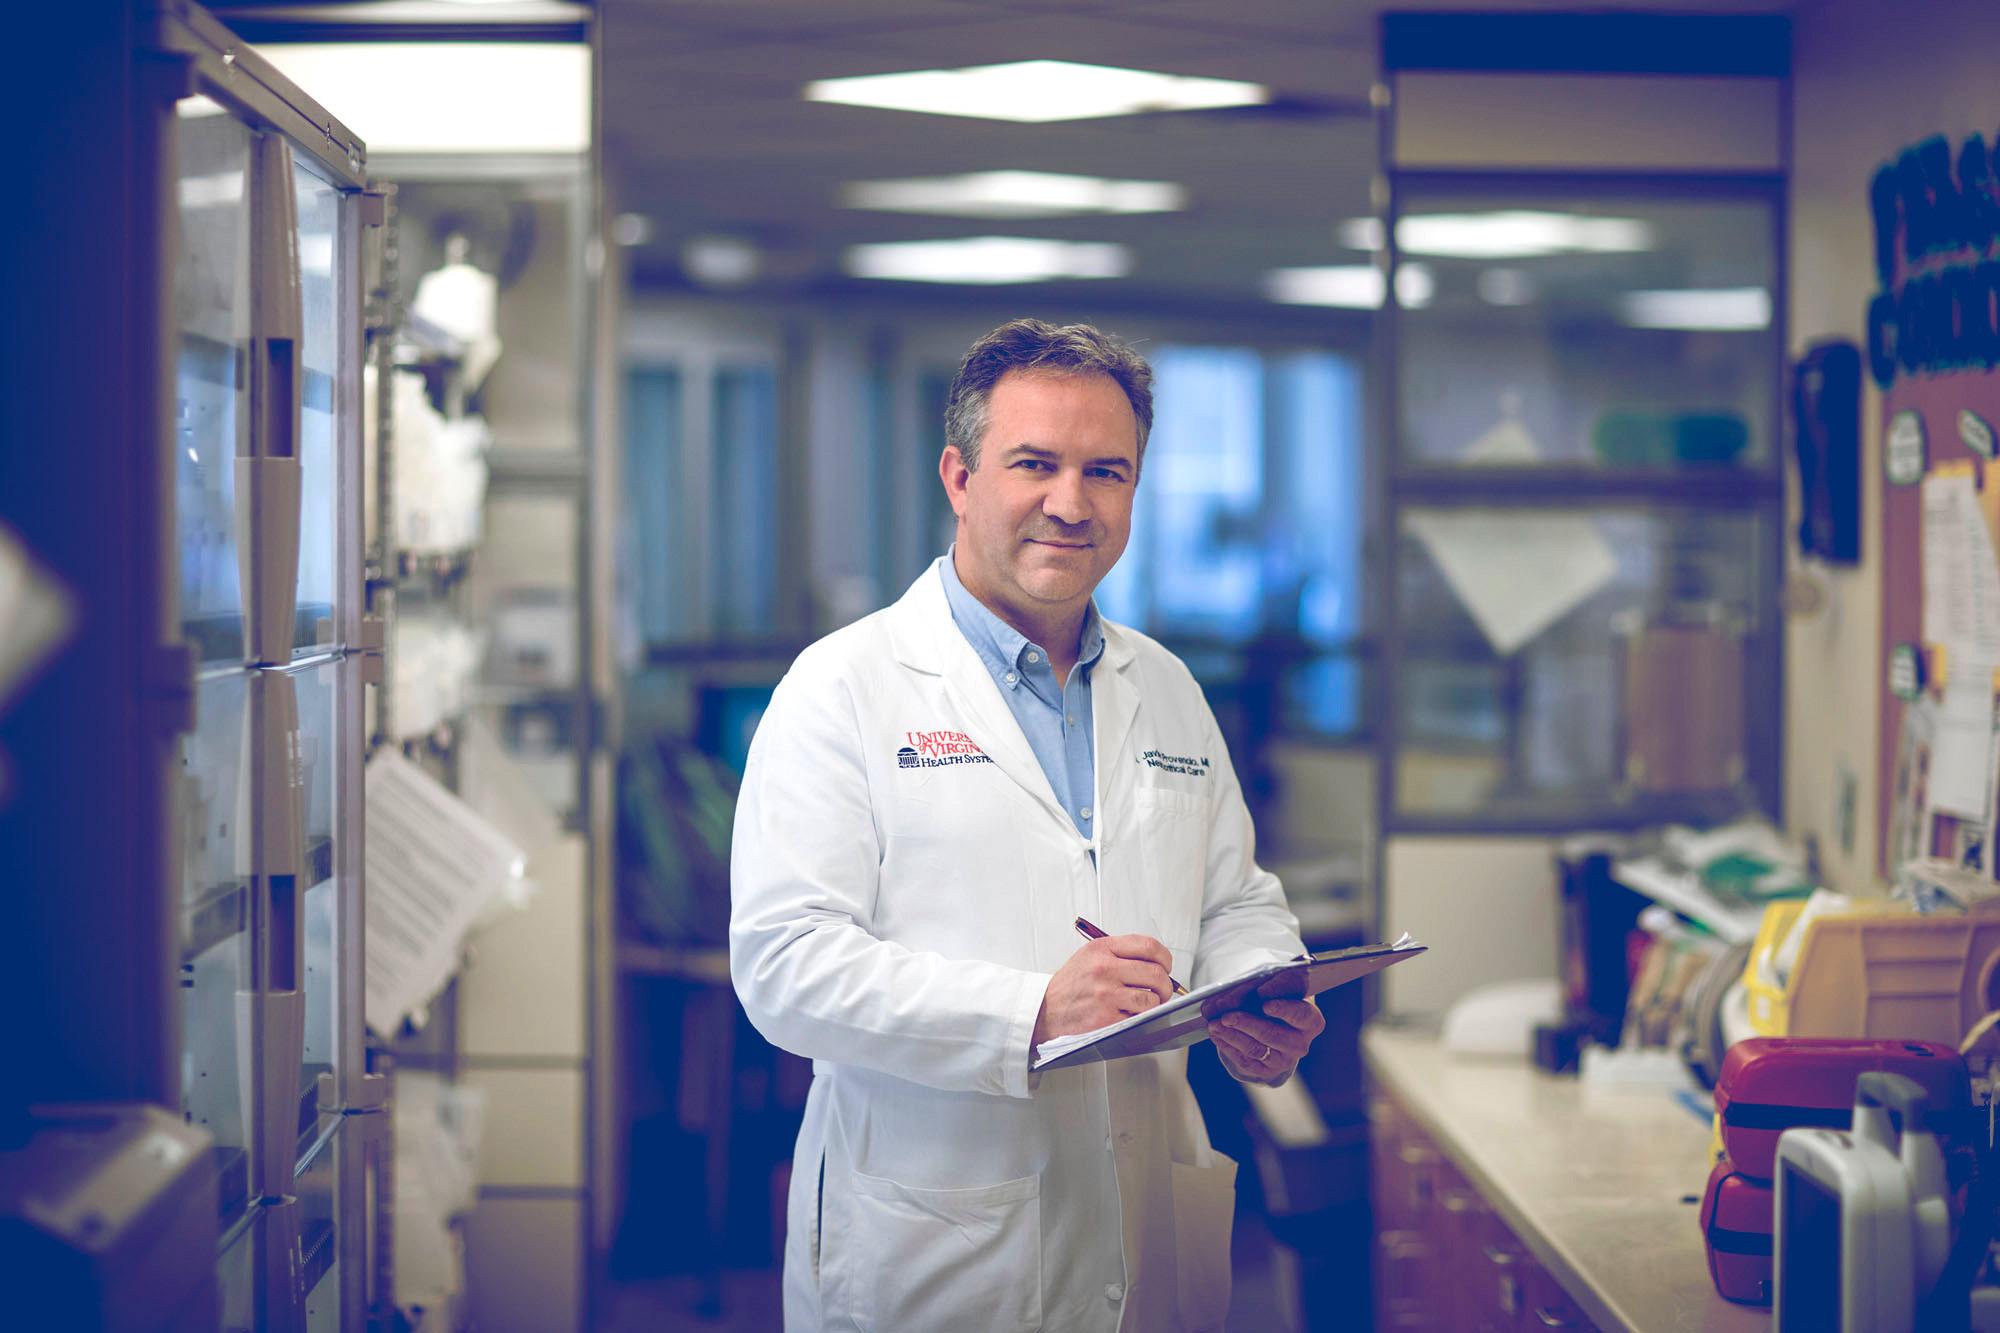 Dr. Javier Provencio is an associate professor in the University of Virginia's School of Medicine and director of UVA's Nerancy Neuroscience Intensive Care Unit.